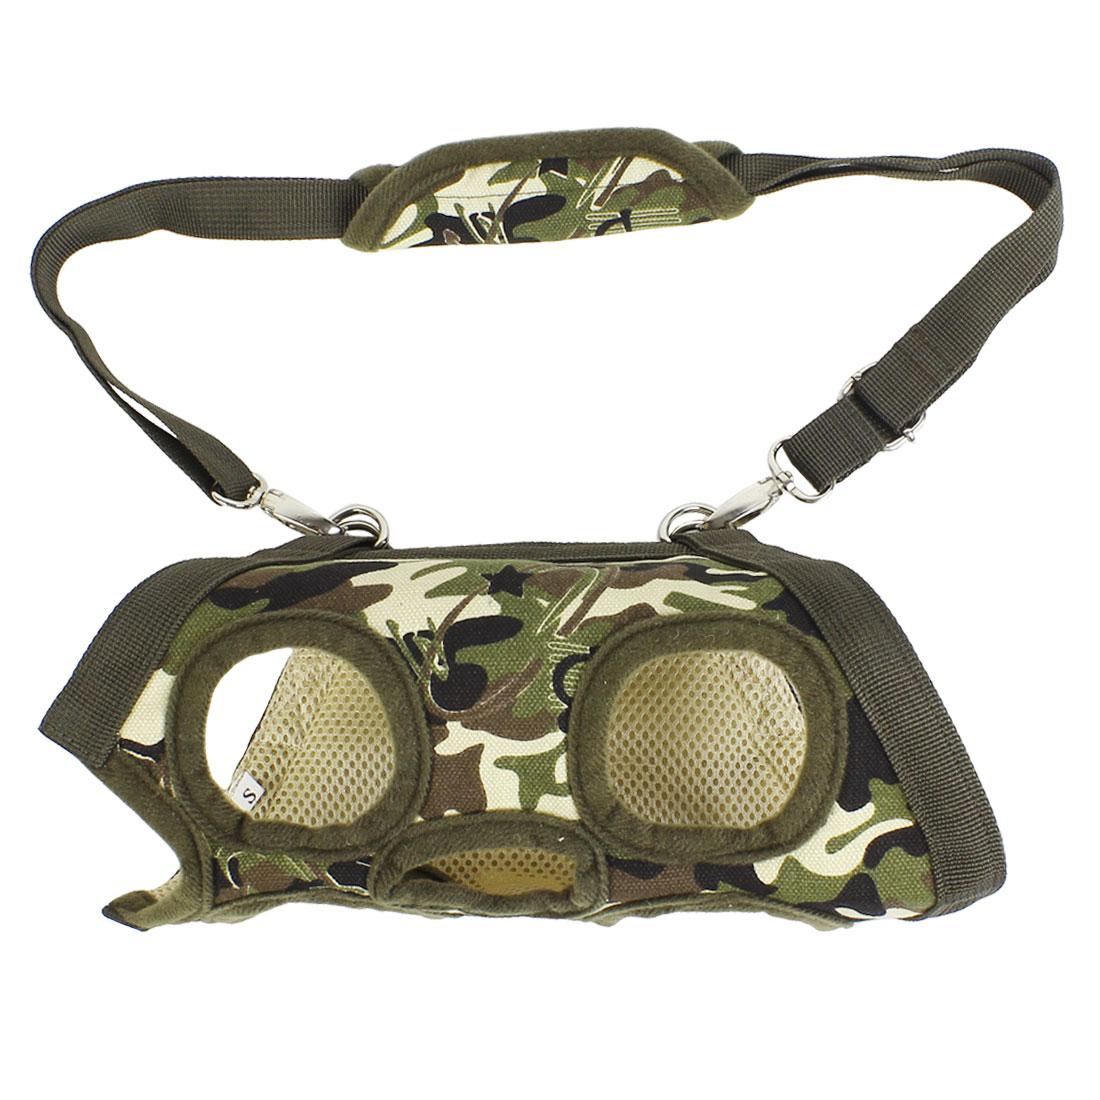 Army Green Zipper Closure Pet Cat Dog Carrying Bag Harness Vest Adjustable Leash XS